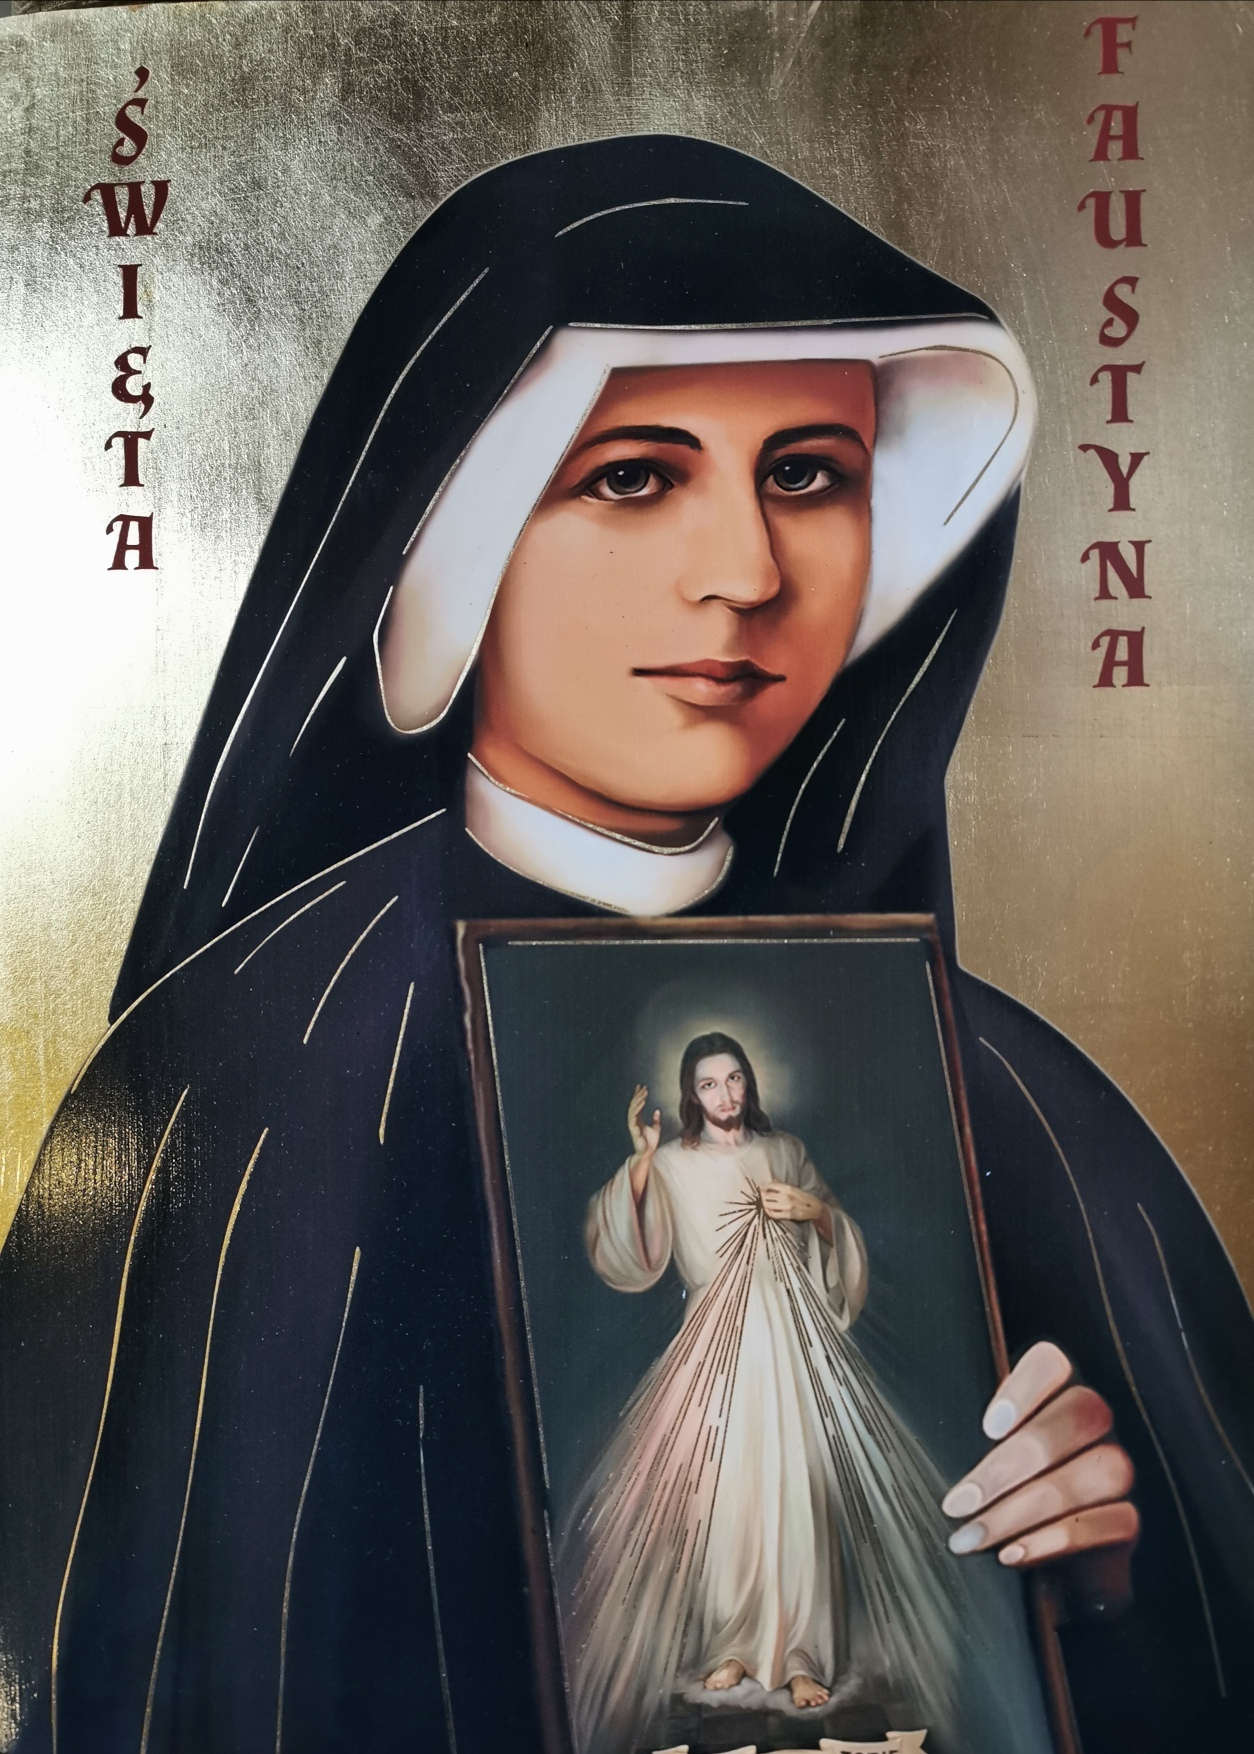 Faustyna 1